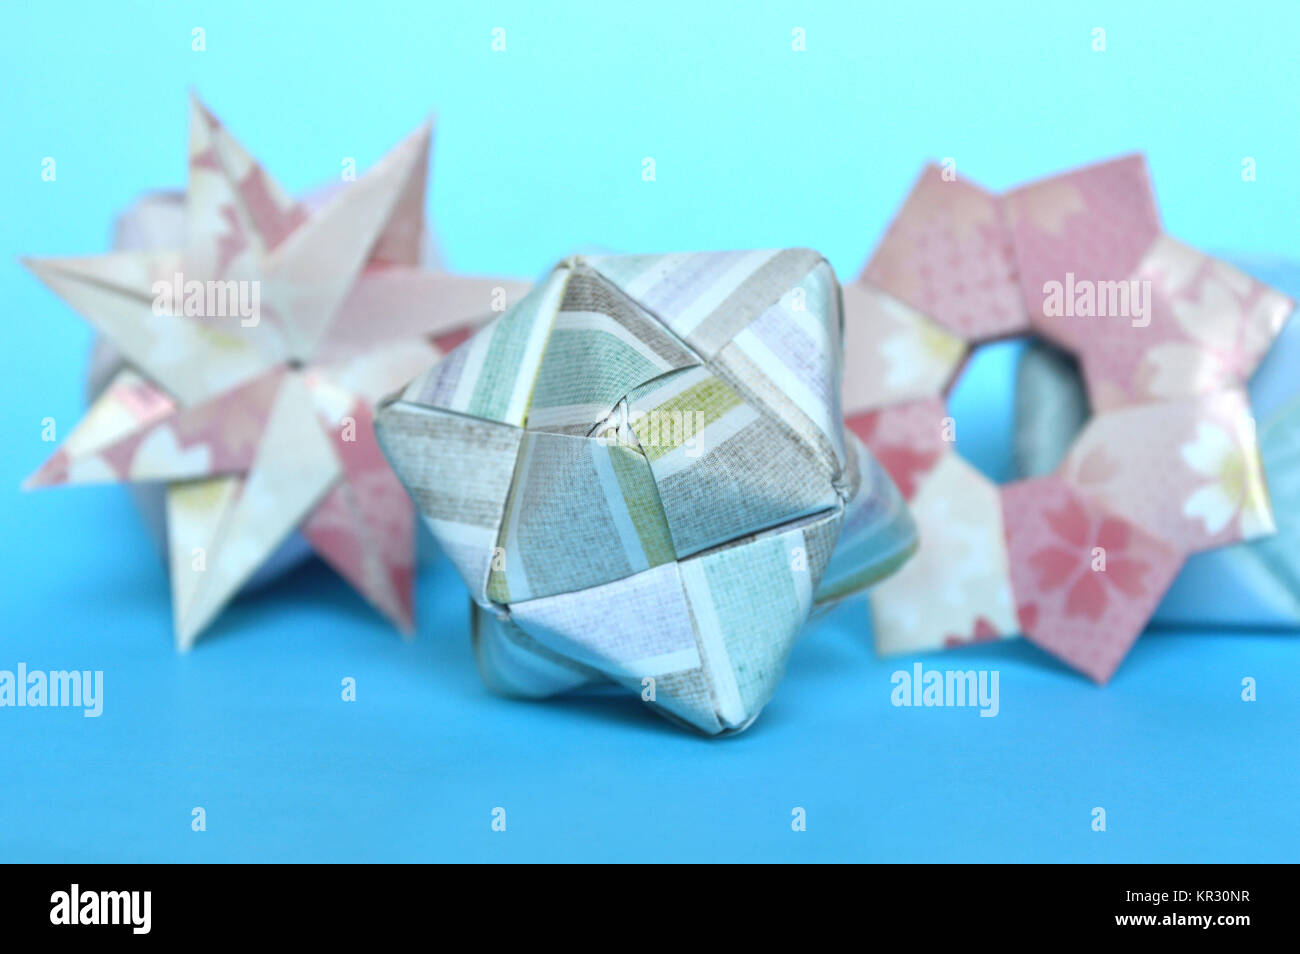 Origami Ball Stock Photos & Origami Ball Stock Images - Alamy - photo#39